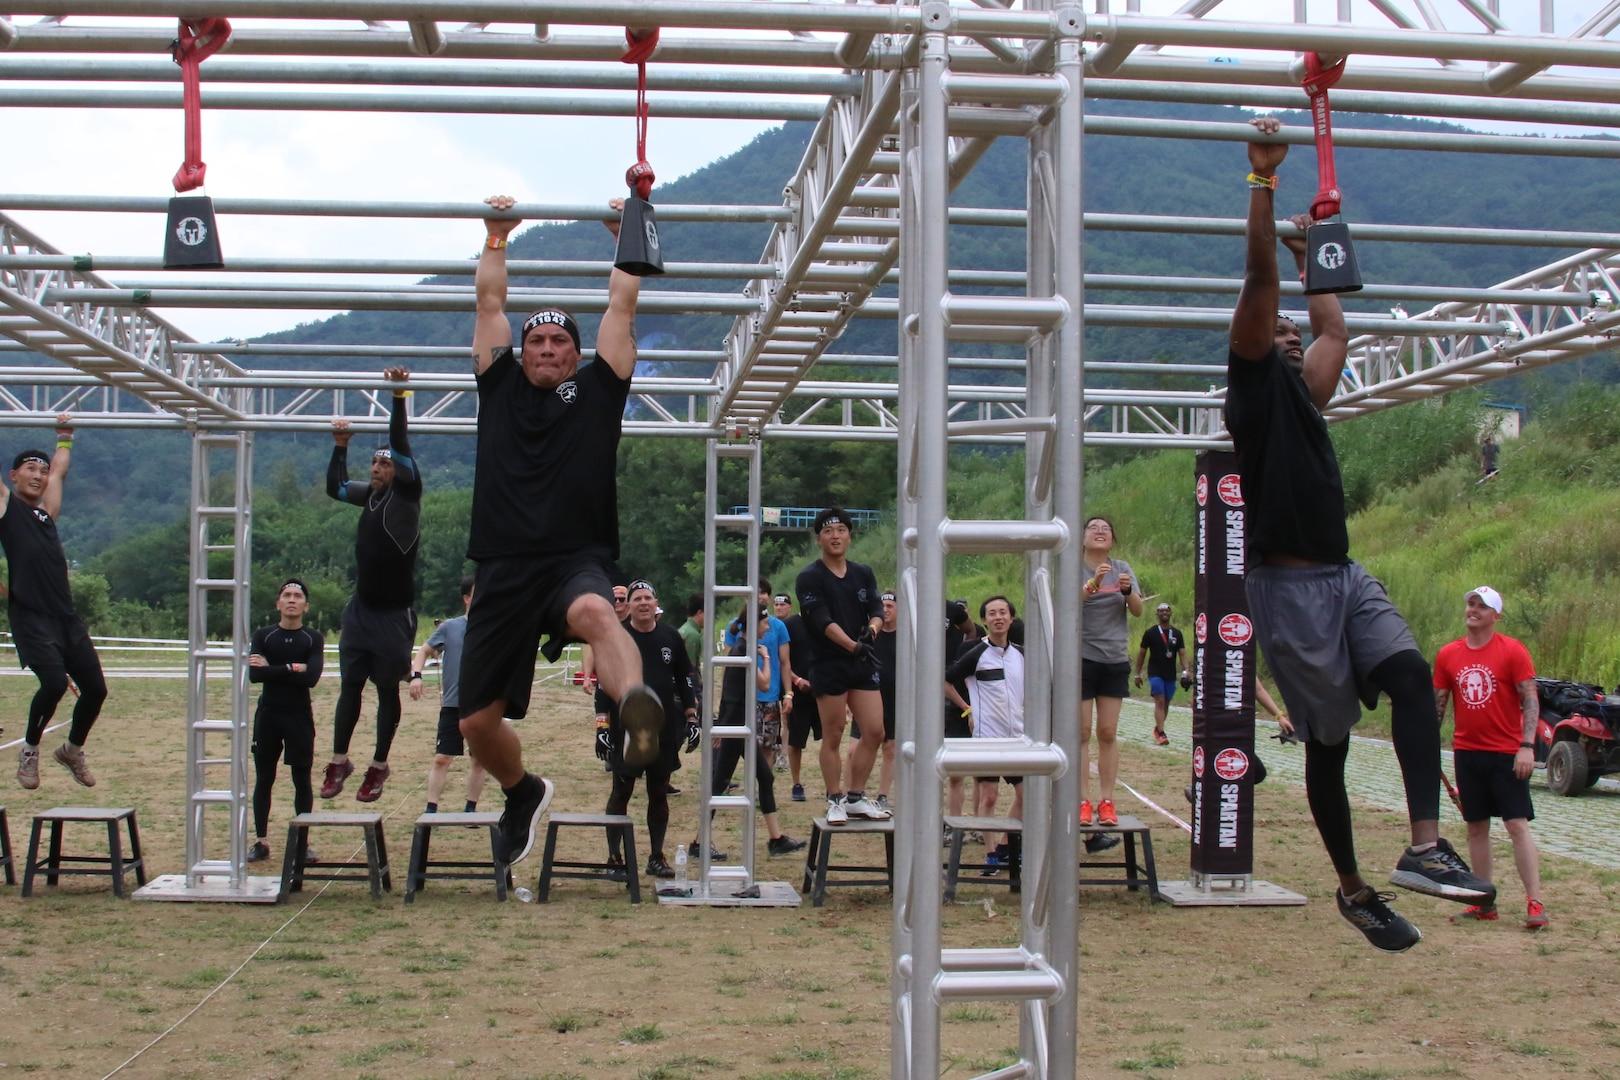 Senior leaders build camaraderie during Spartan